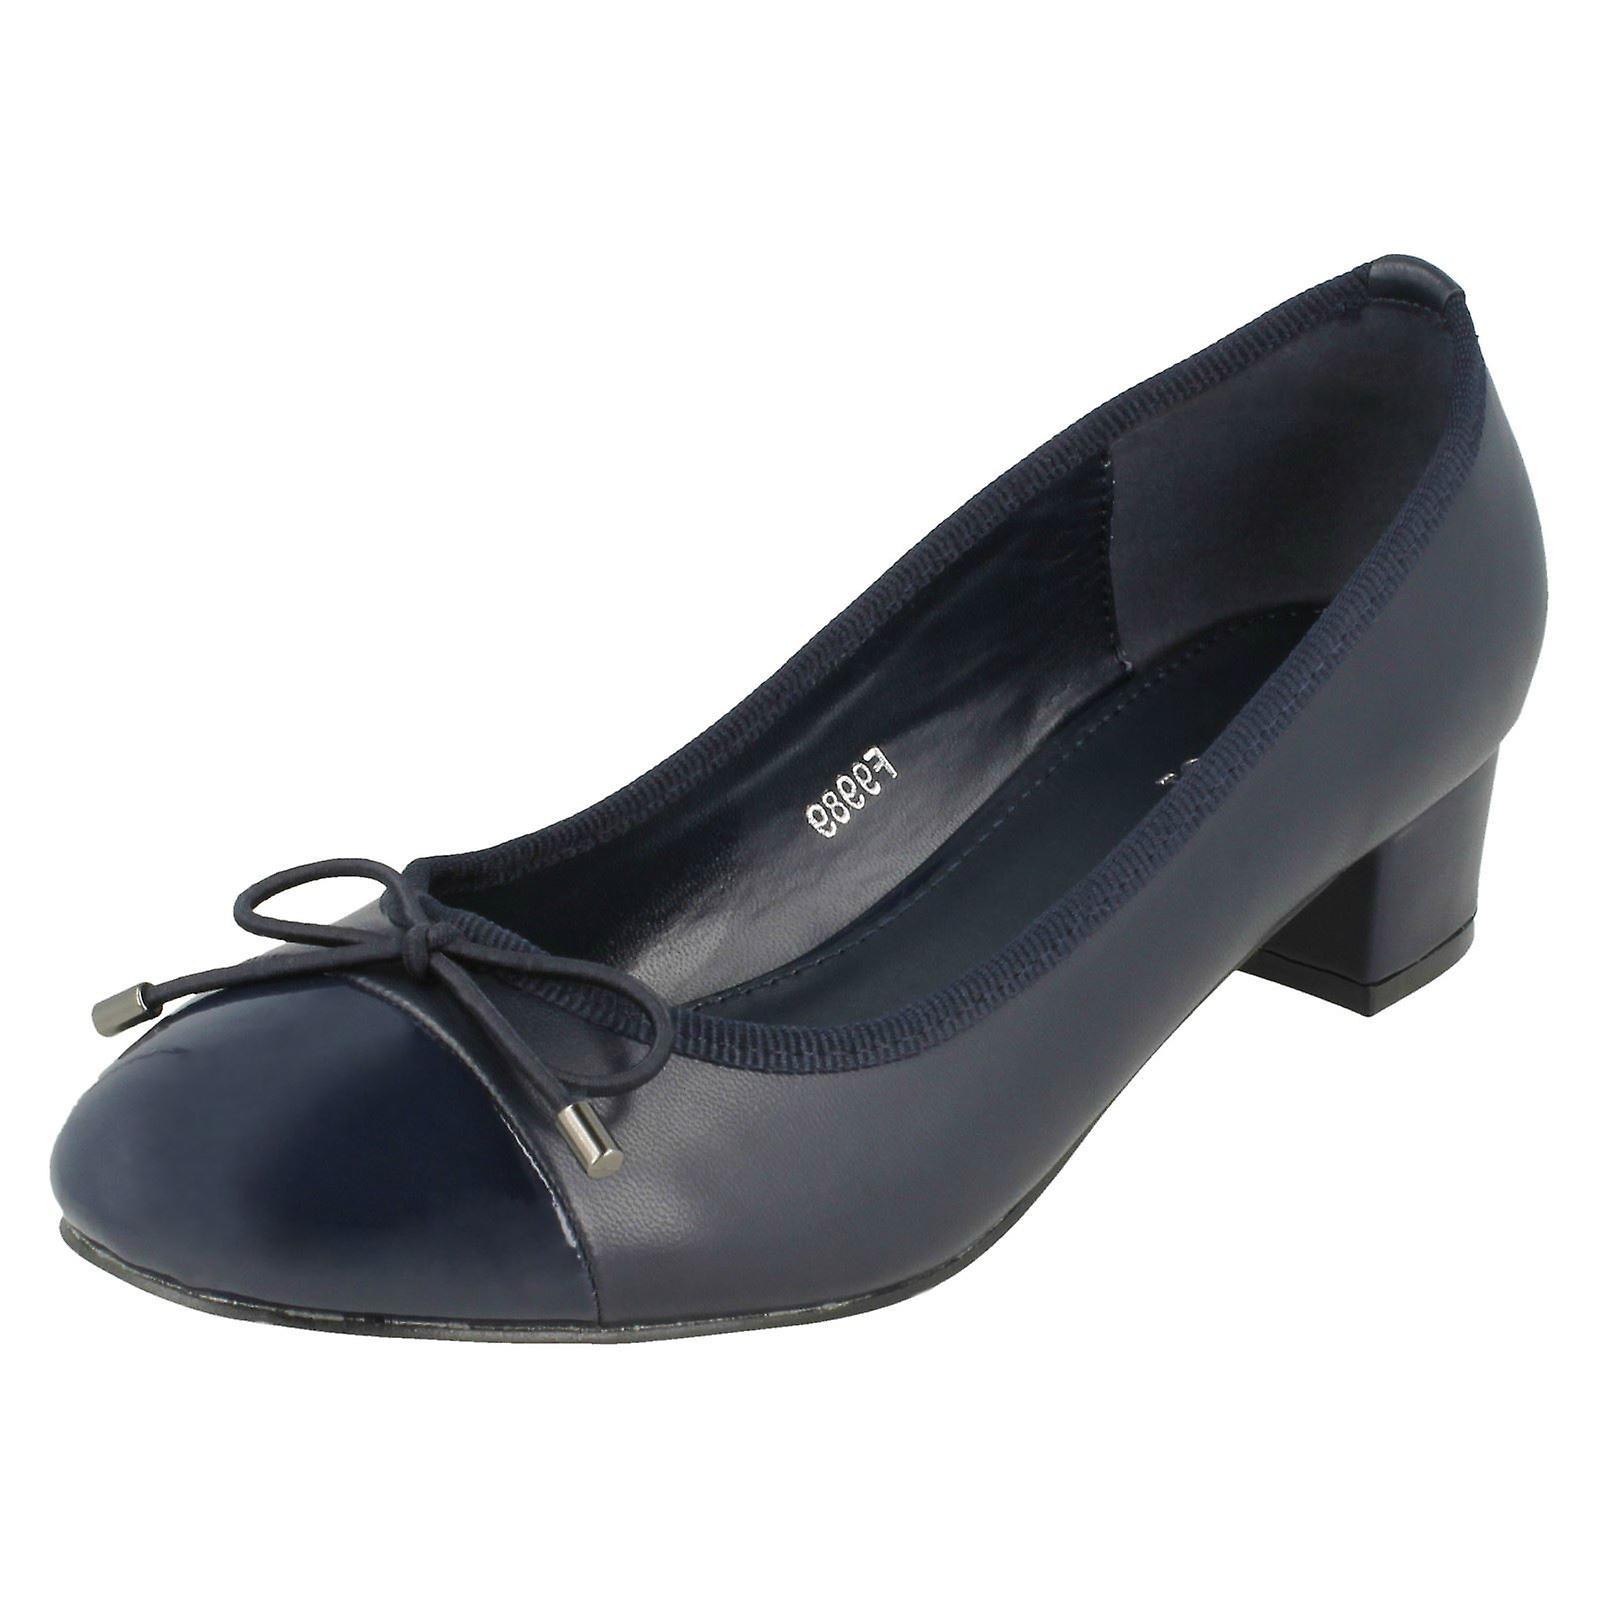 Ladies Spot On Mid Heel Court scarpe F9989 | Aspetto Attraente  | Gentiluomo/Signora Scarpa